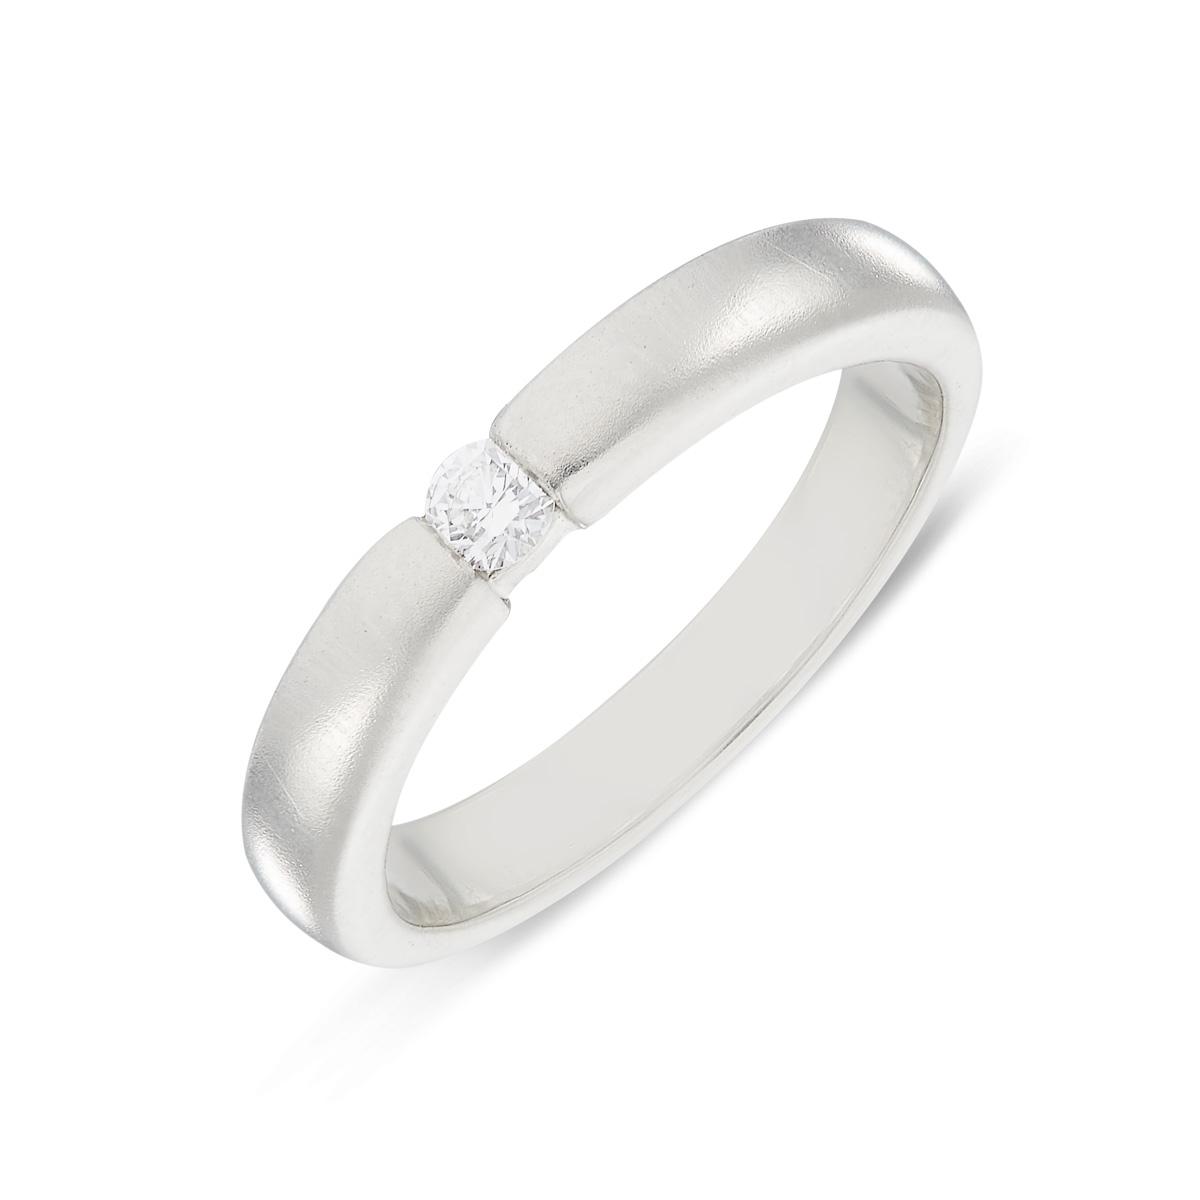 Fastidious Ring